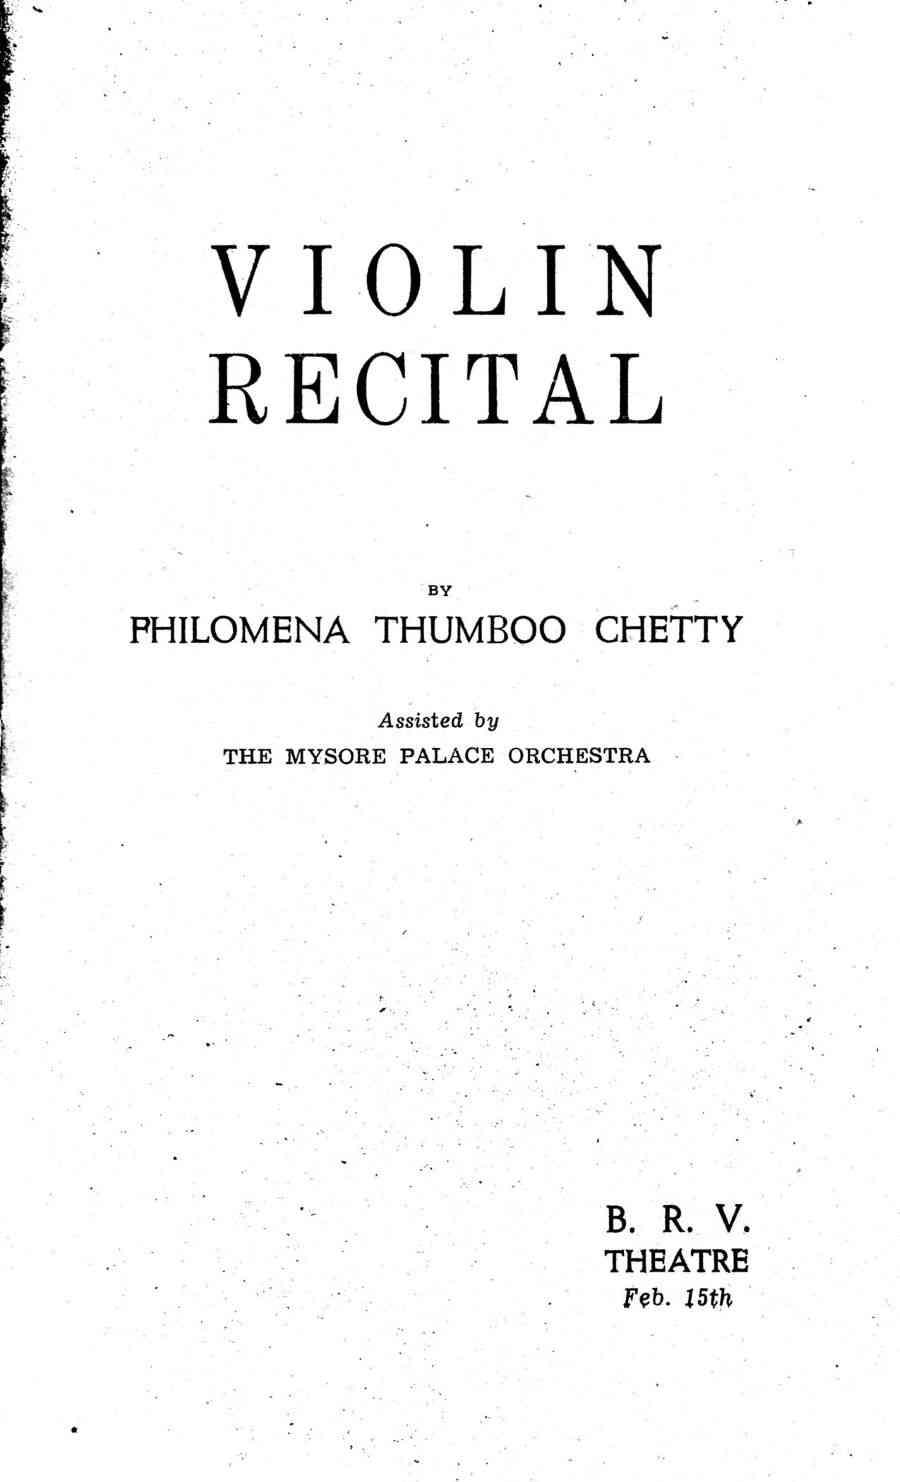 Philomena Thumboochetty: The Indian violinist who drew